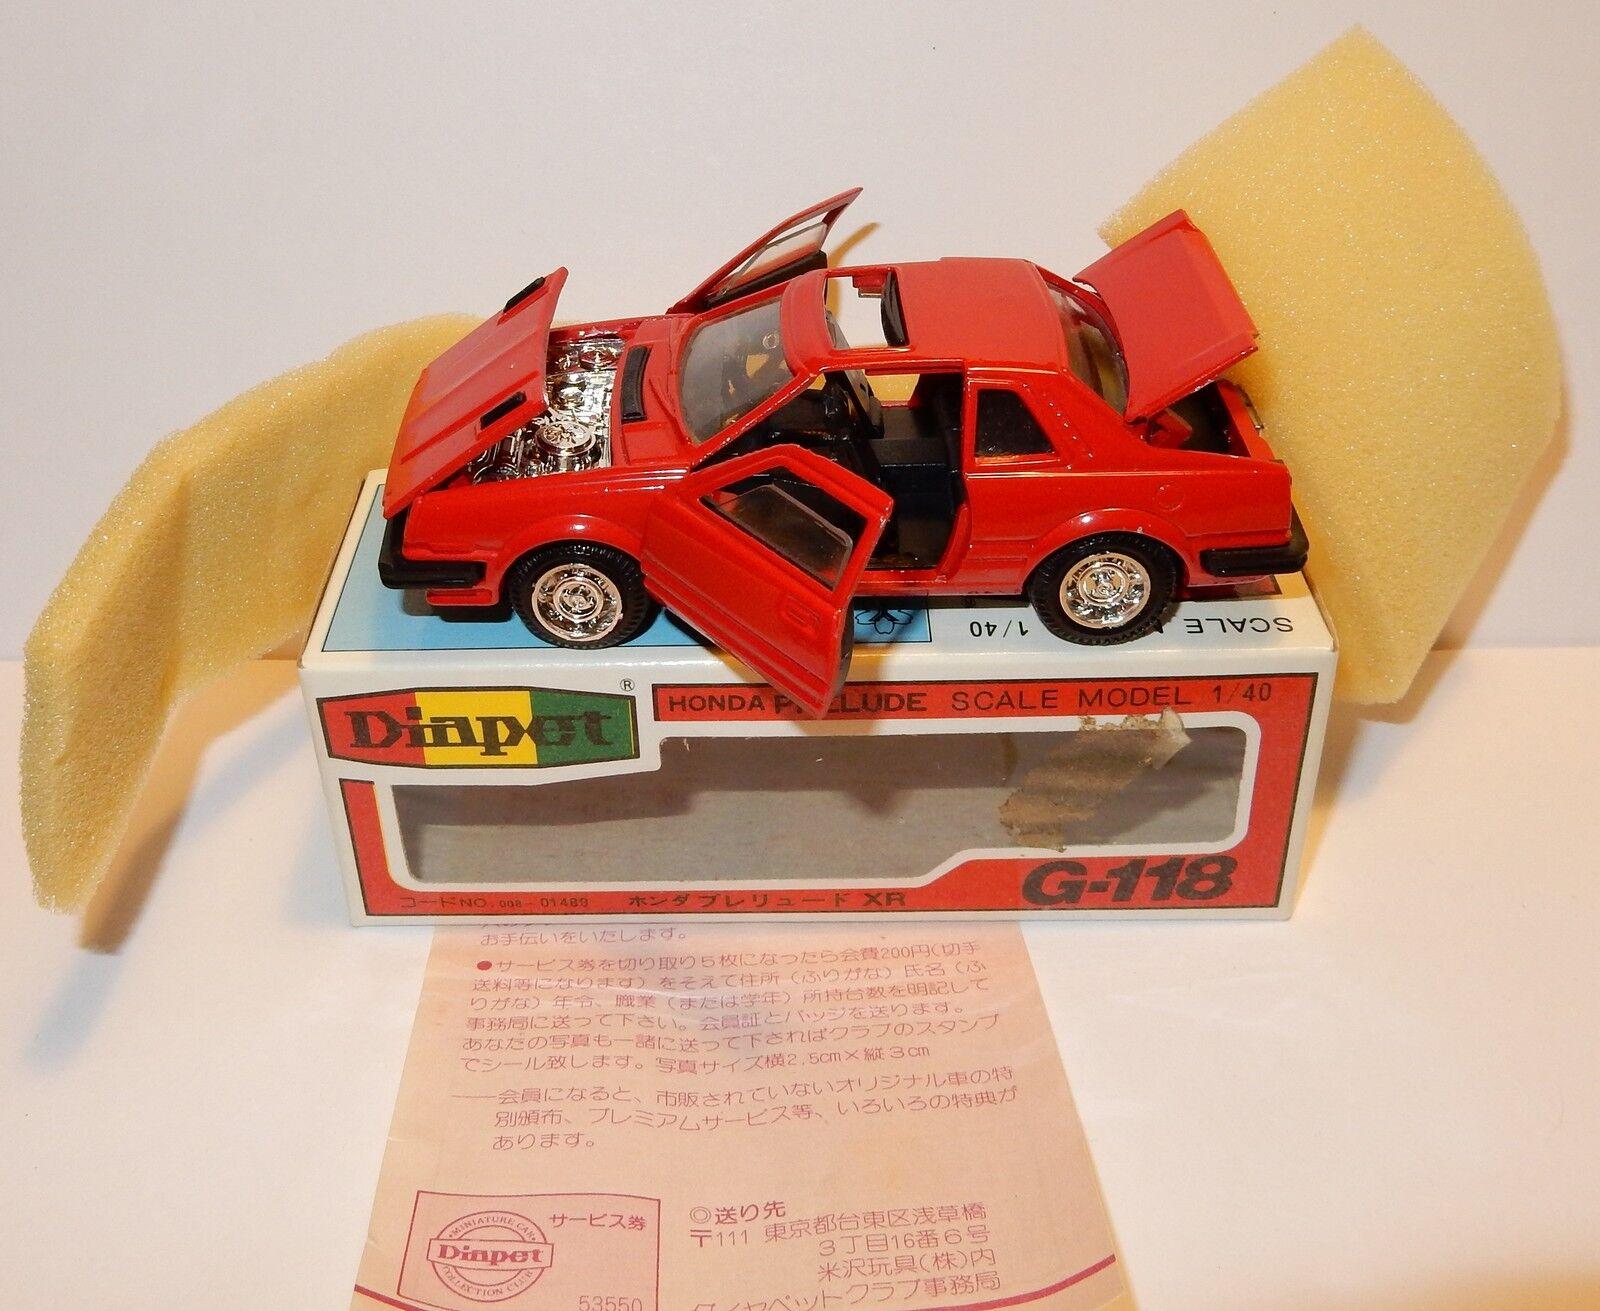 RARE DIAPET DIAPET DIAPET YONEZAWA TOYS HONDA PRELUDE REF 1489  G118 MADE IN JAPAN 1990 1d0b84